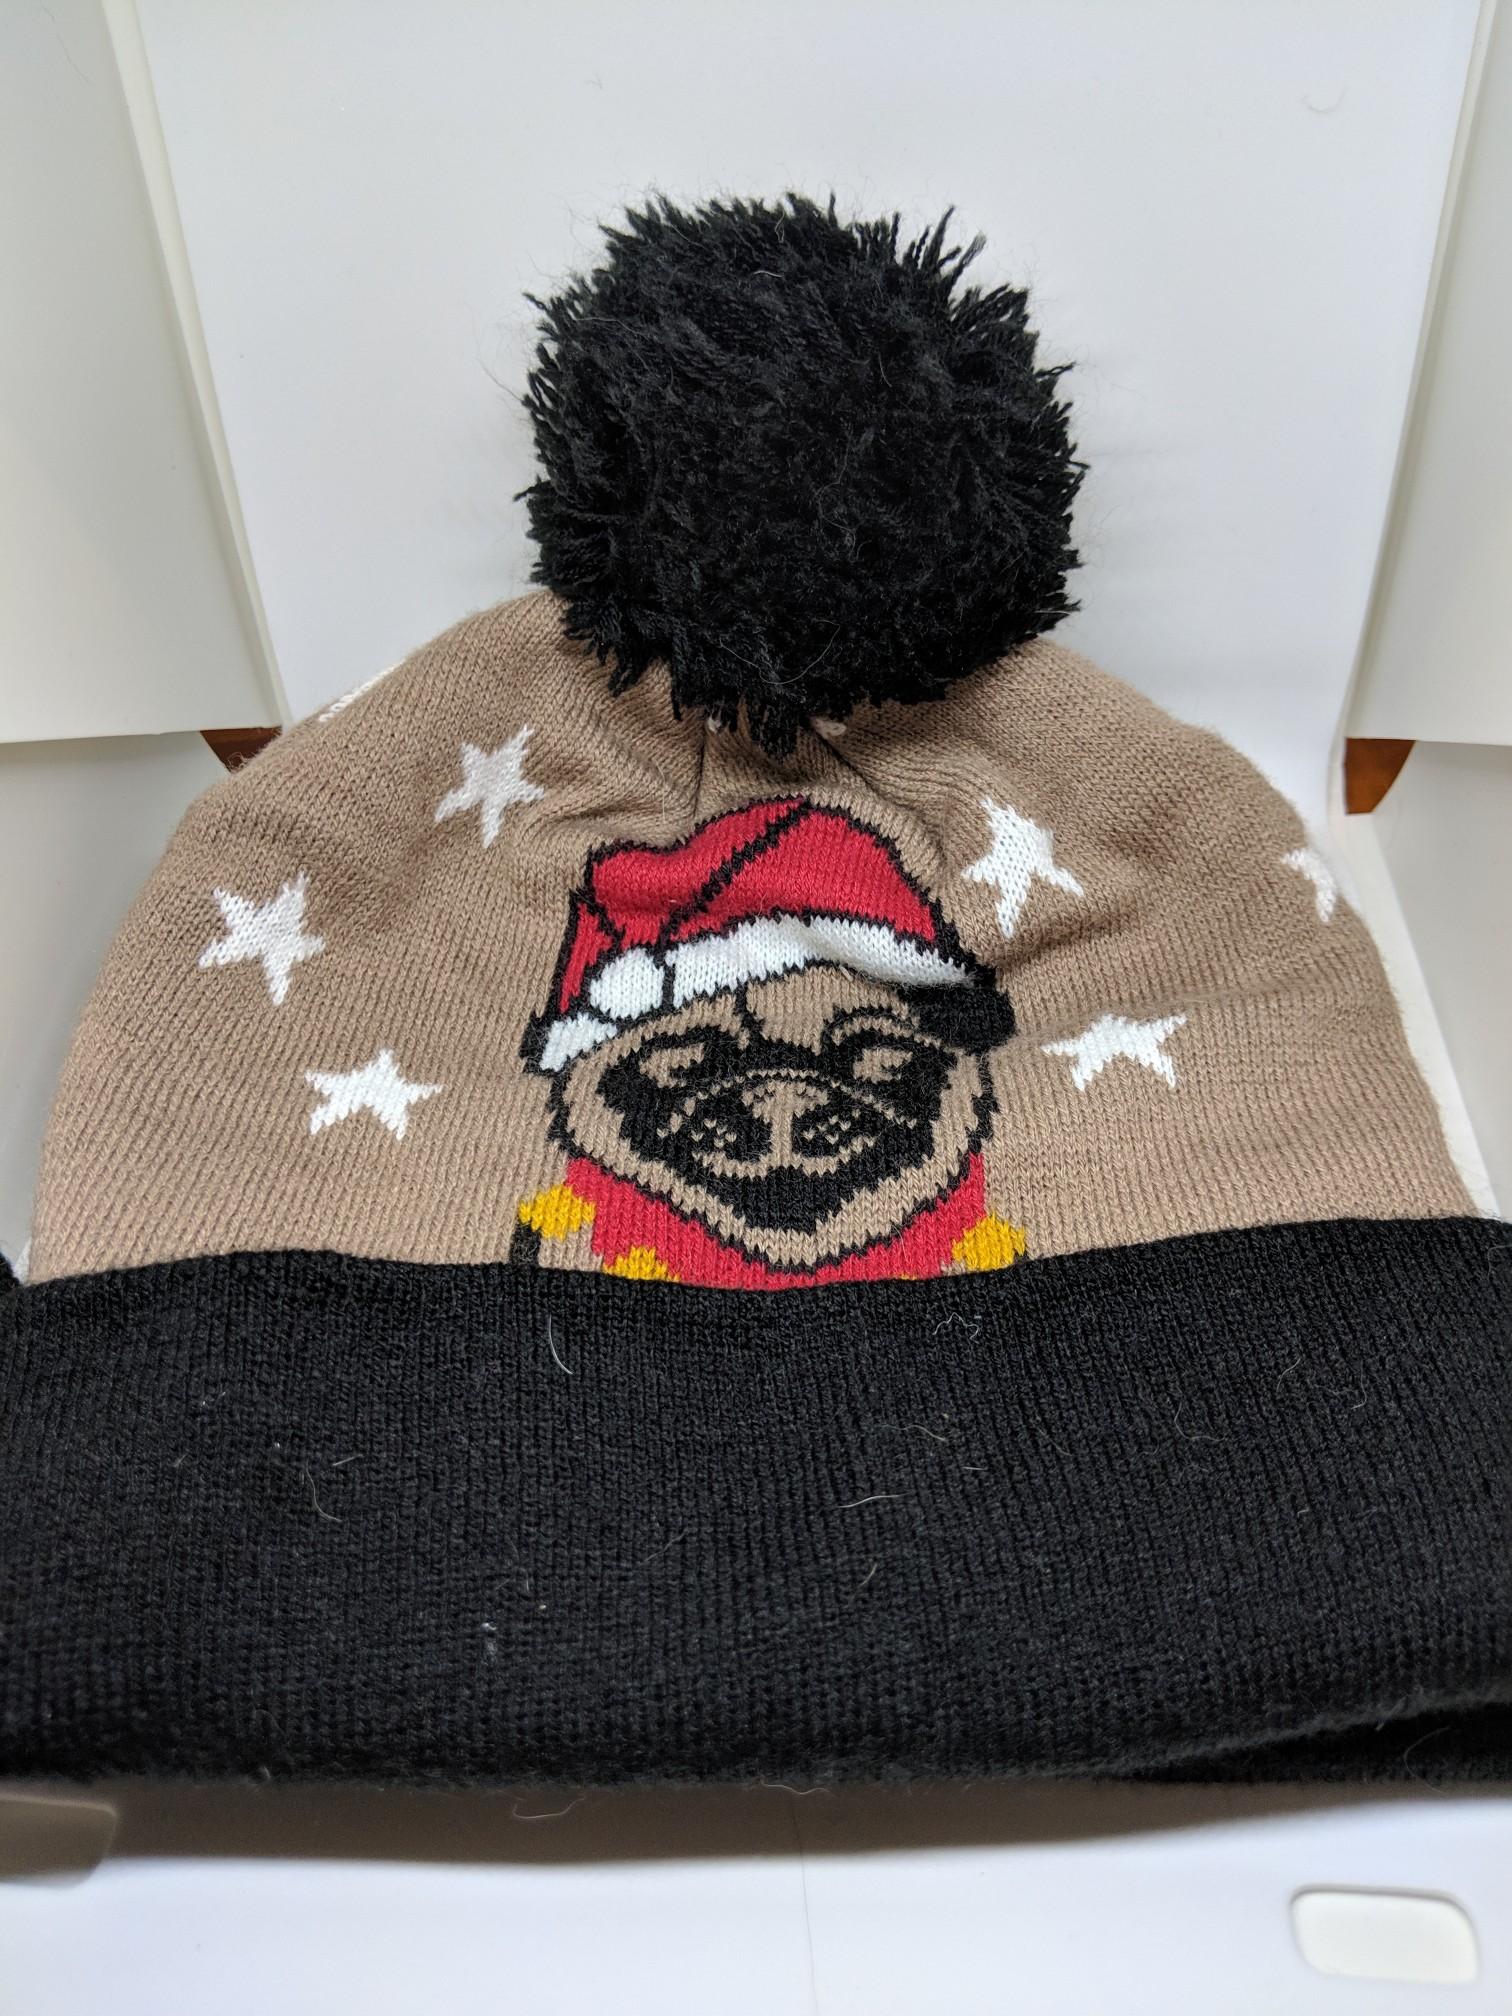 Santa Christmas Pug Beanie Toque · Pugfrey Bogart · Online Store ... 0daaecfd173